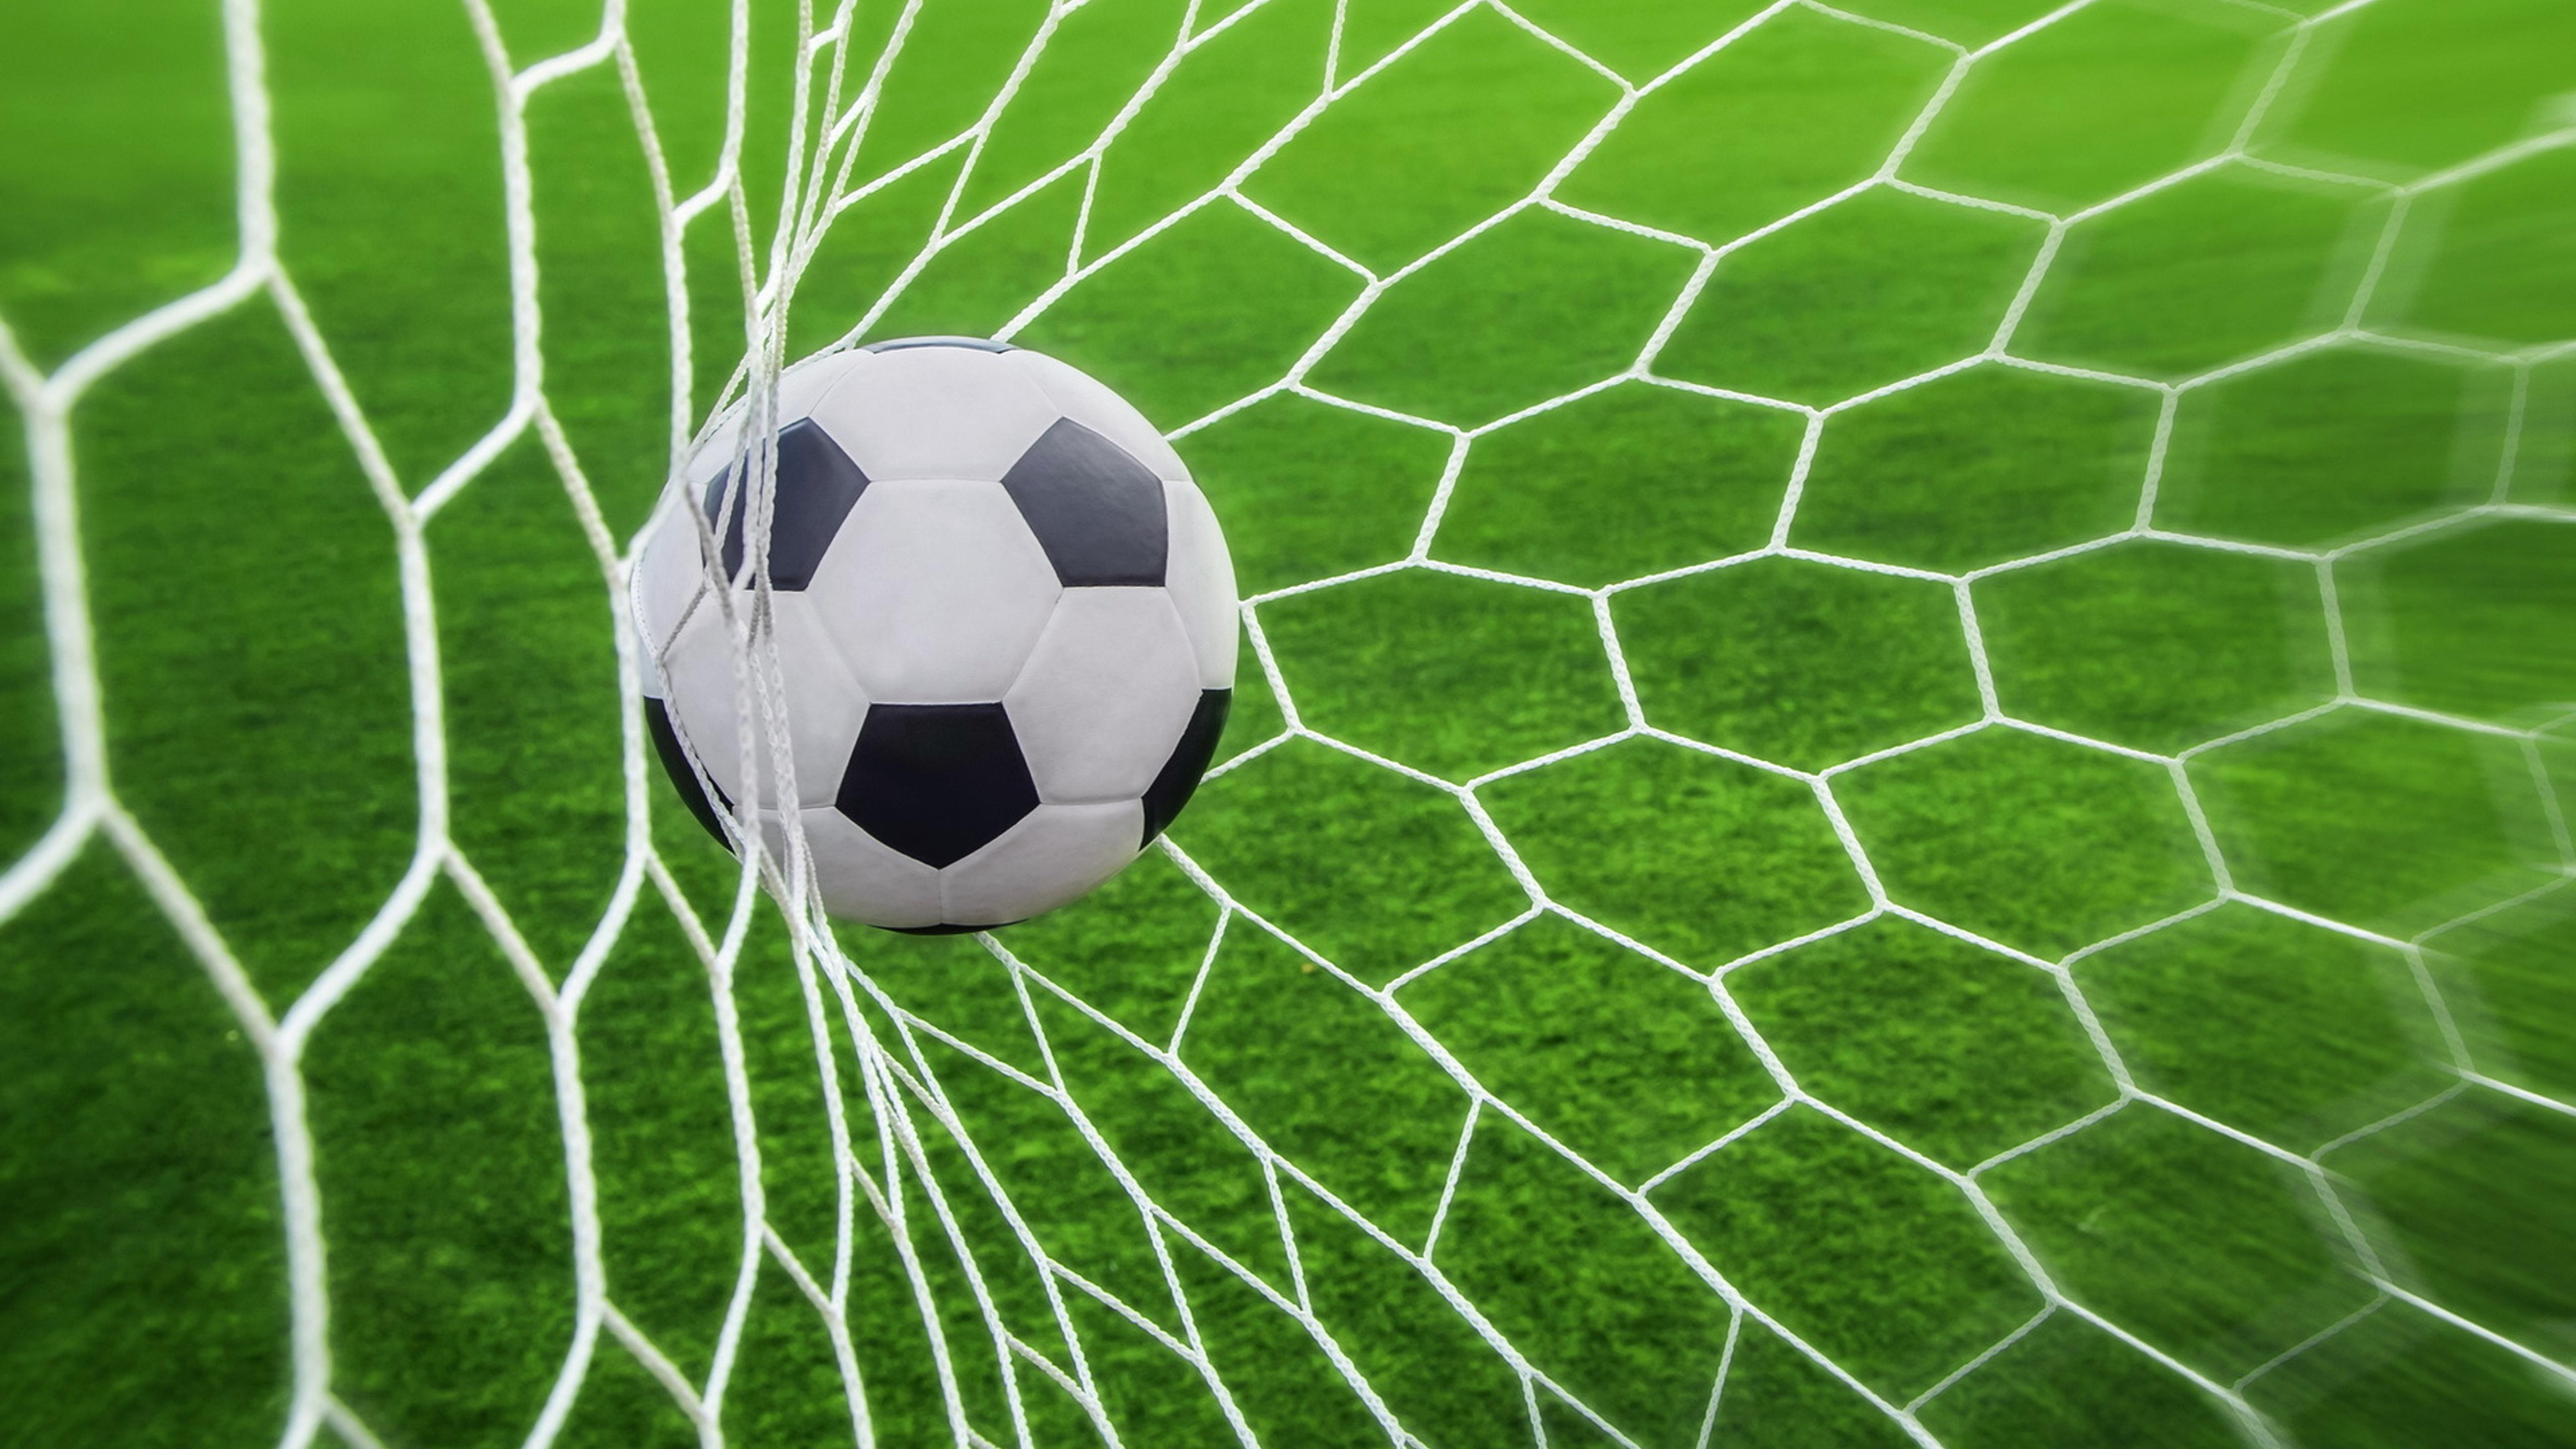 Soccer Goal Wallpaper Download 5120x2880